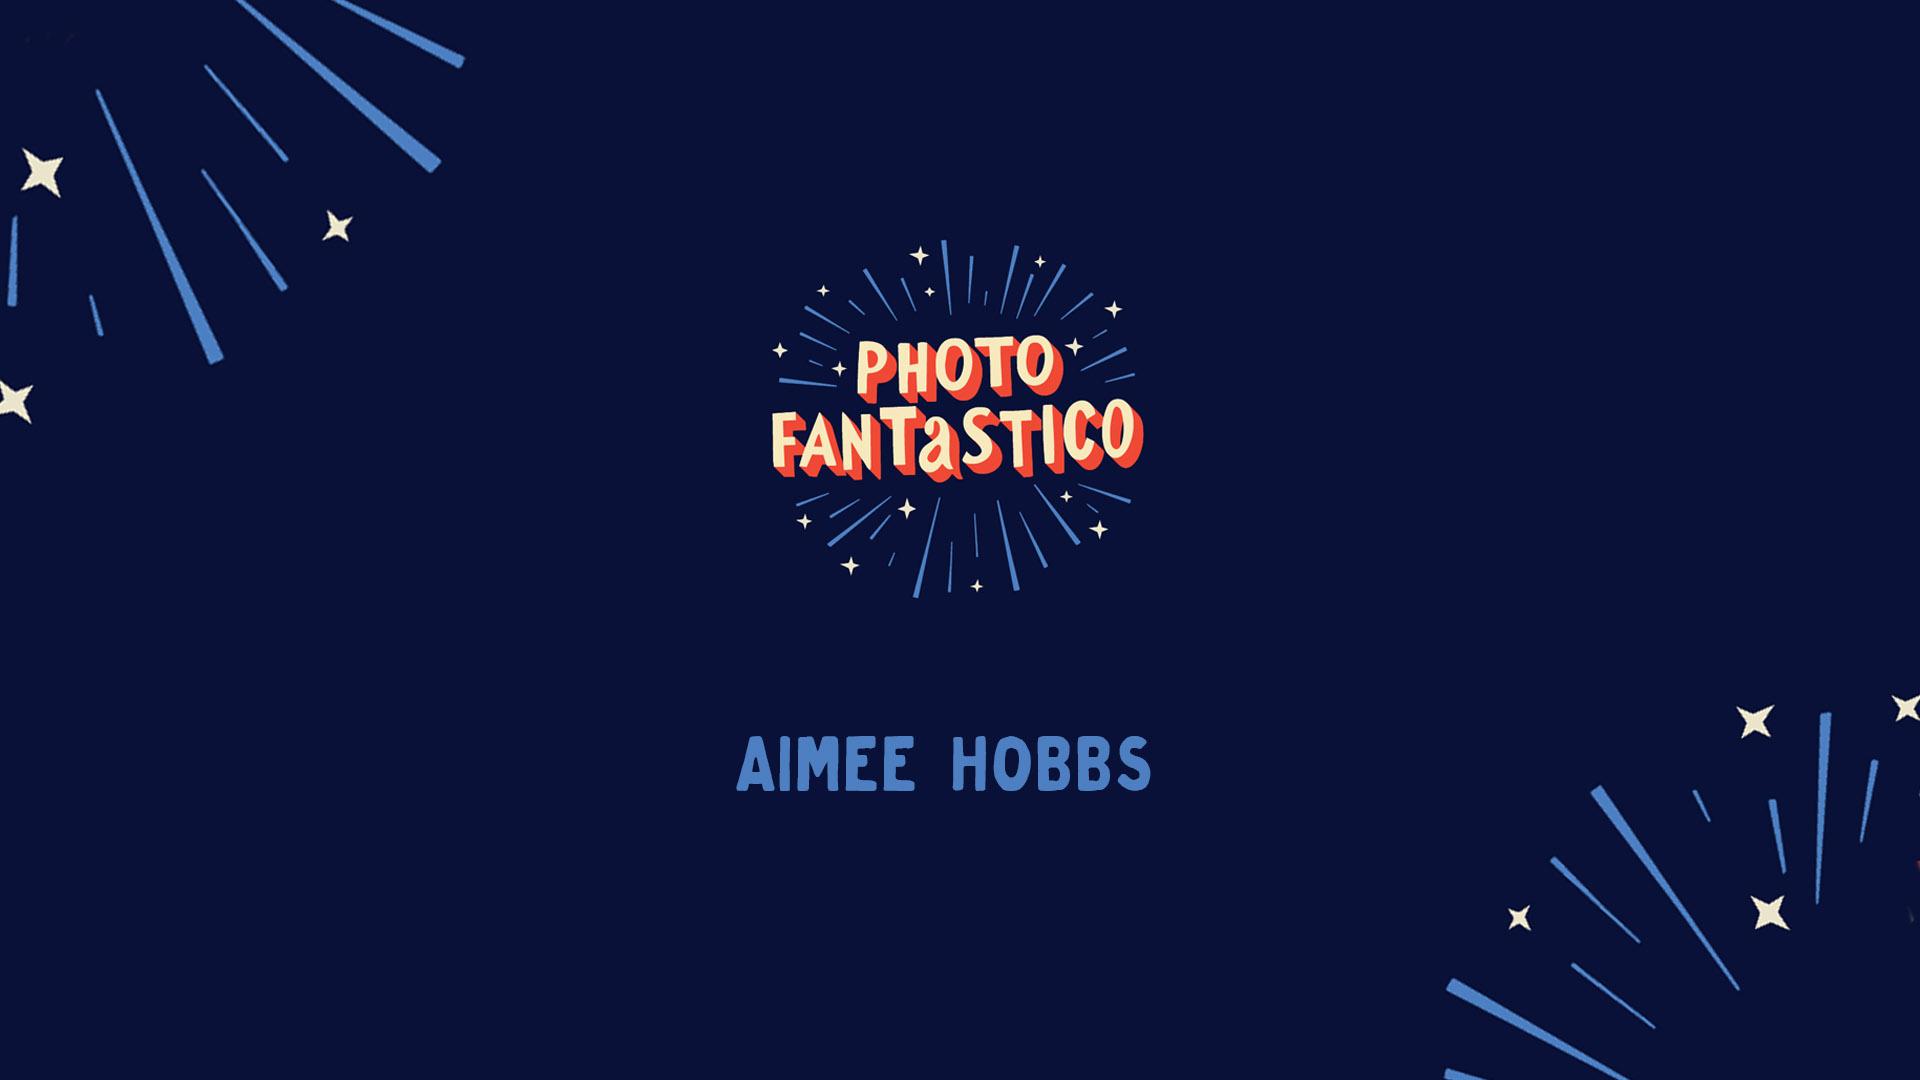 Aimee Hobbs